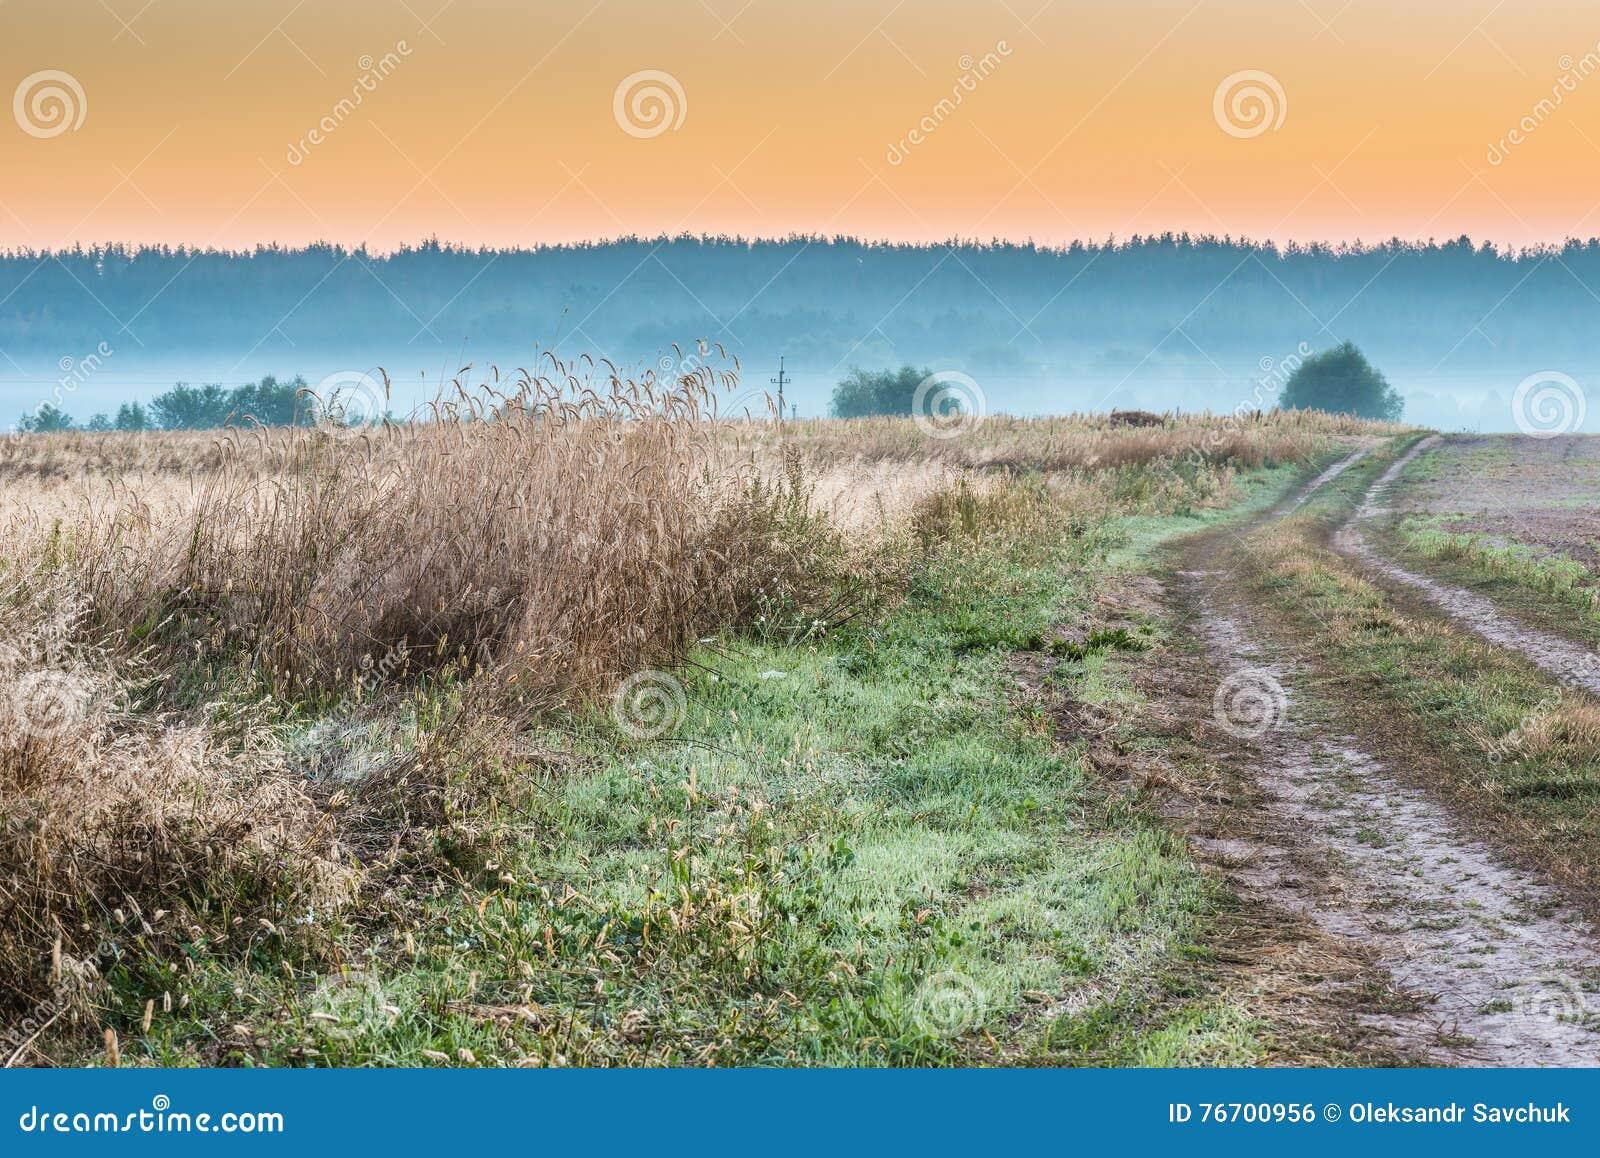 Mistige ochtend op een gebied